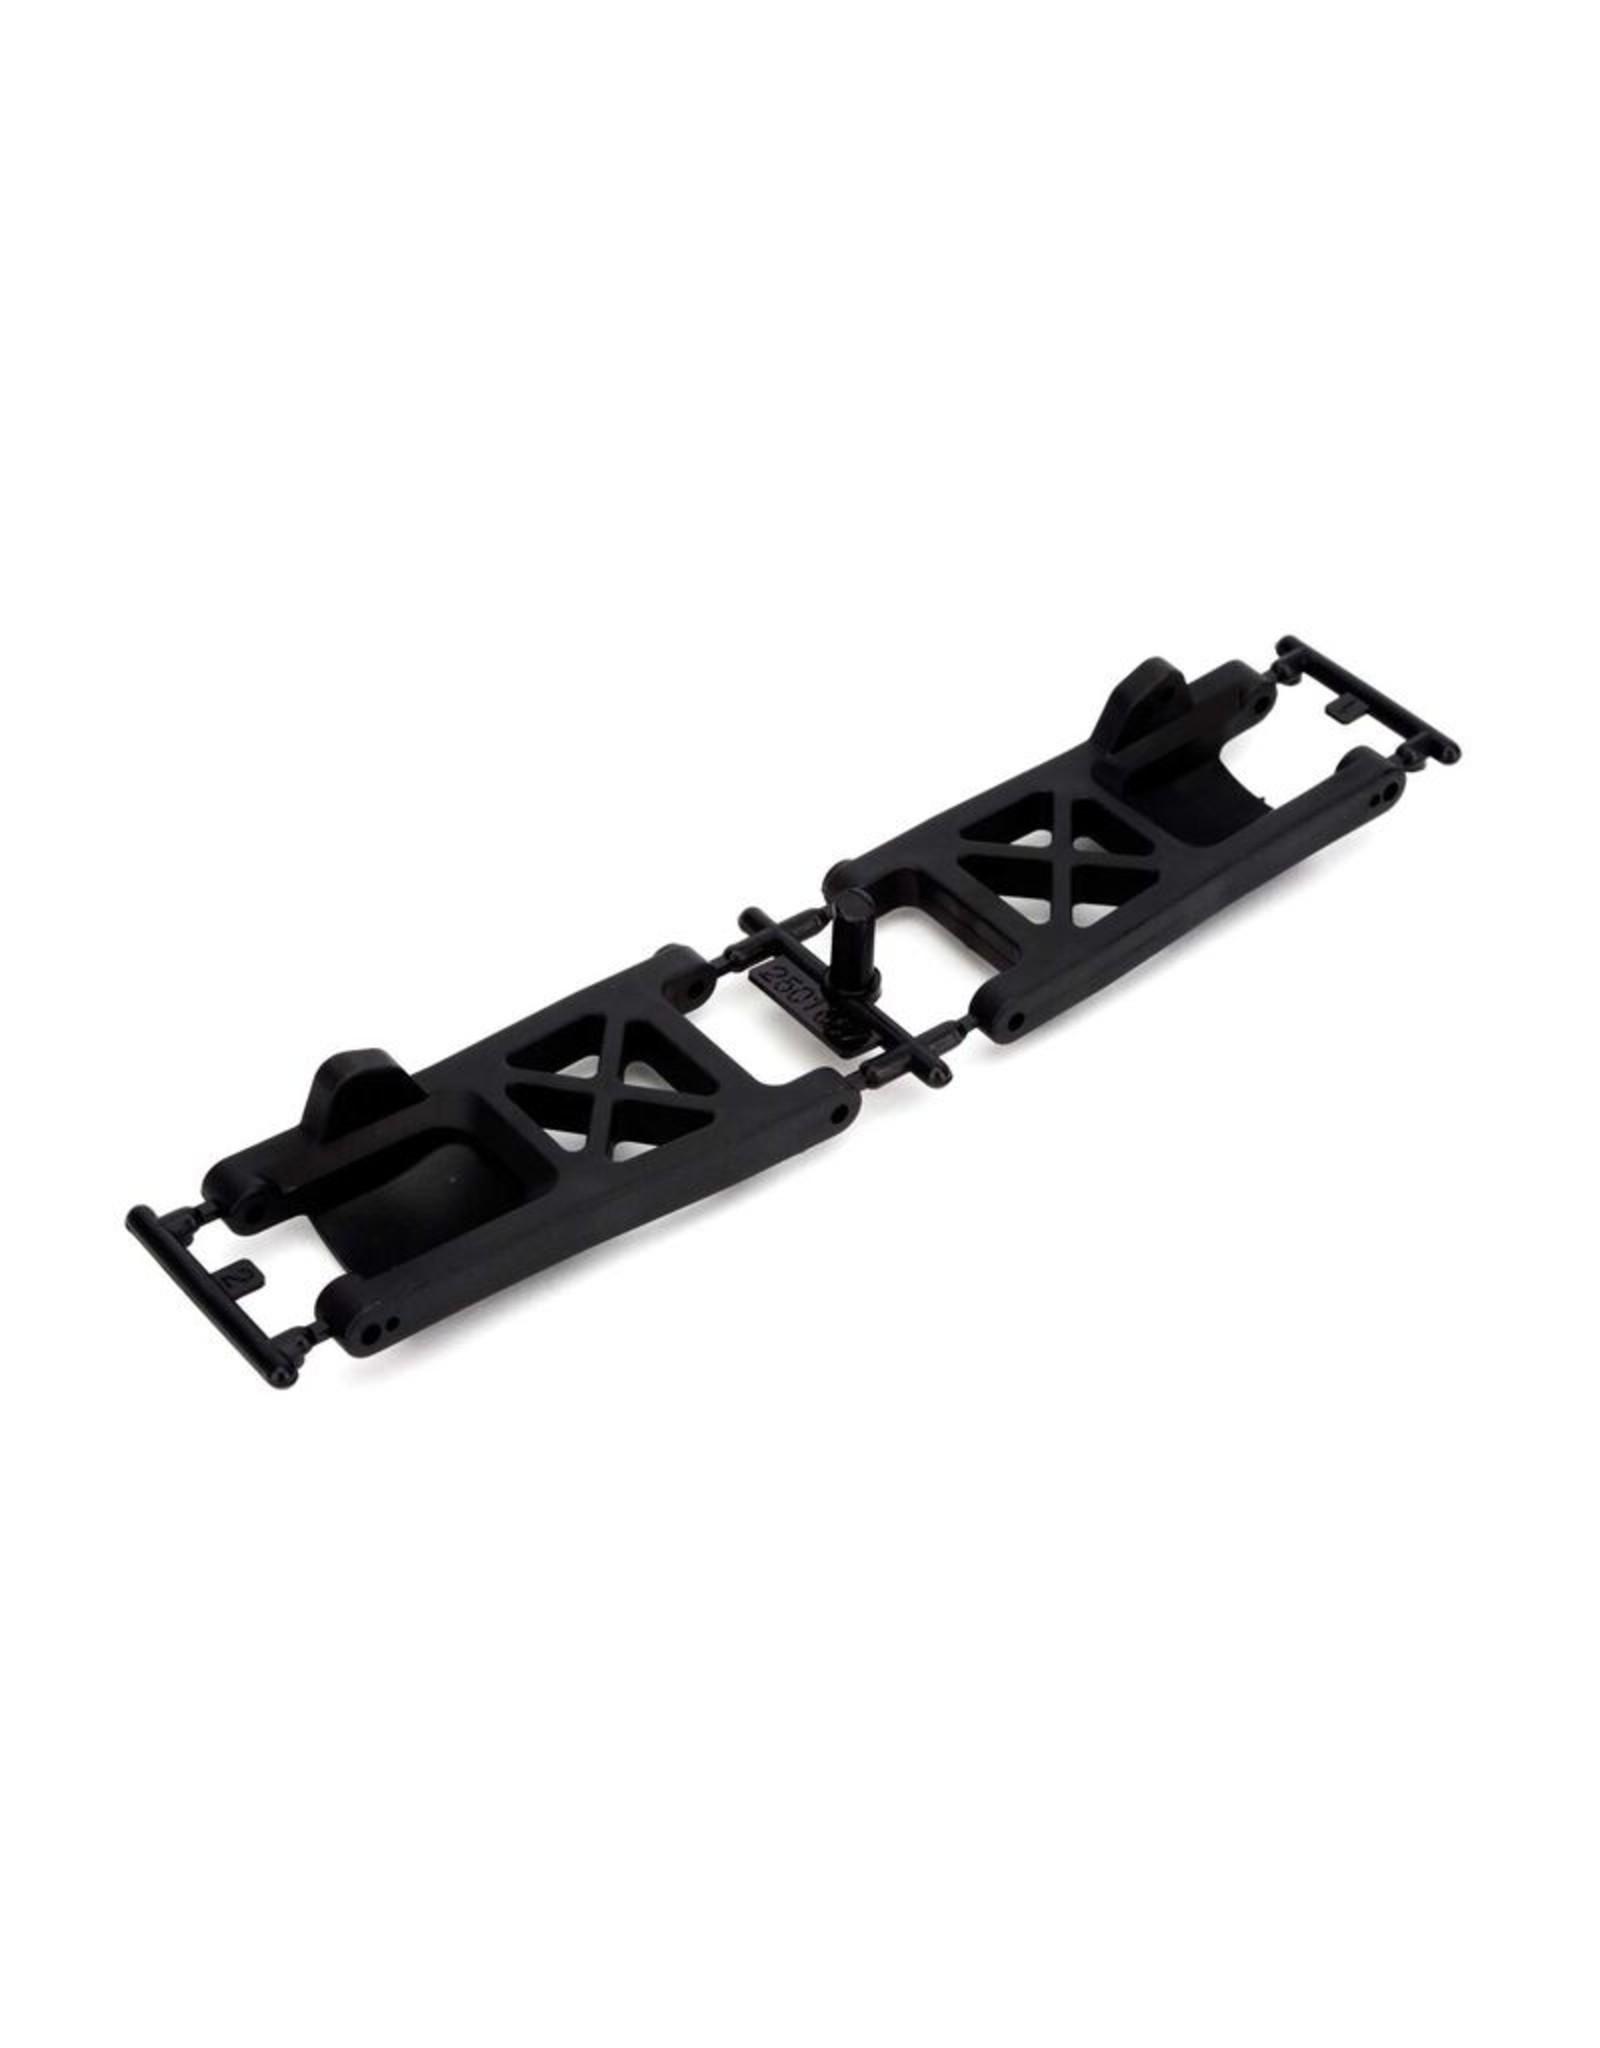 ECX 3009 - Rear Suspension Arm (2): 1/10 2WD Boost